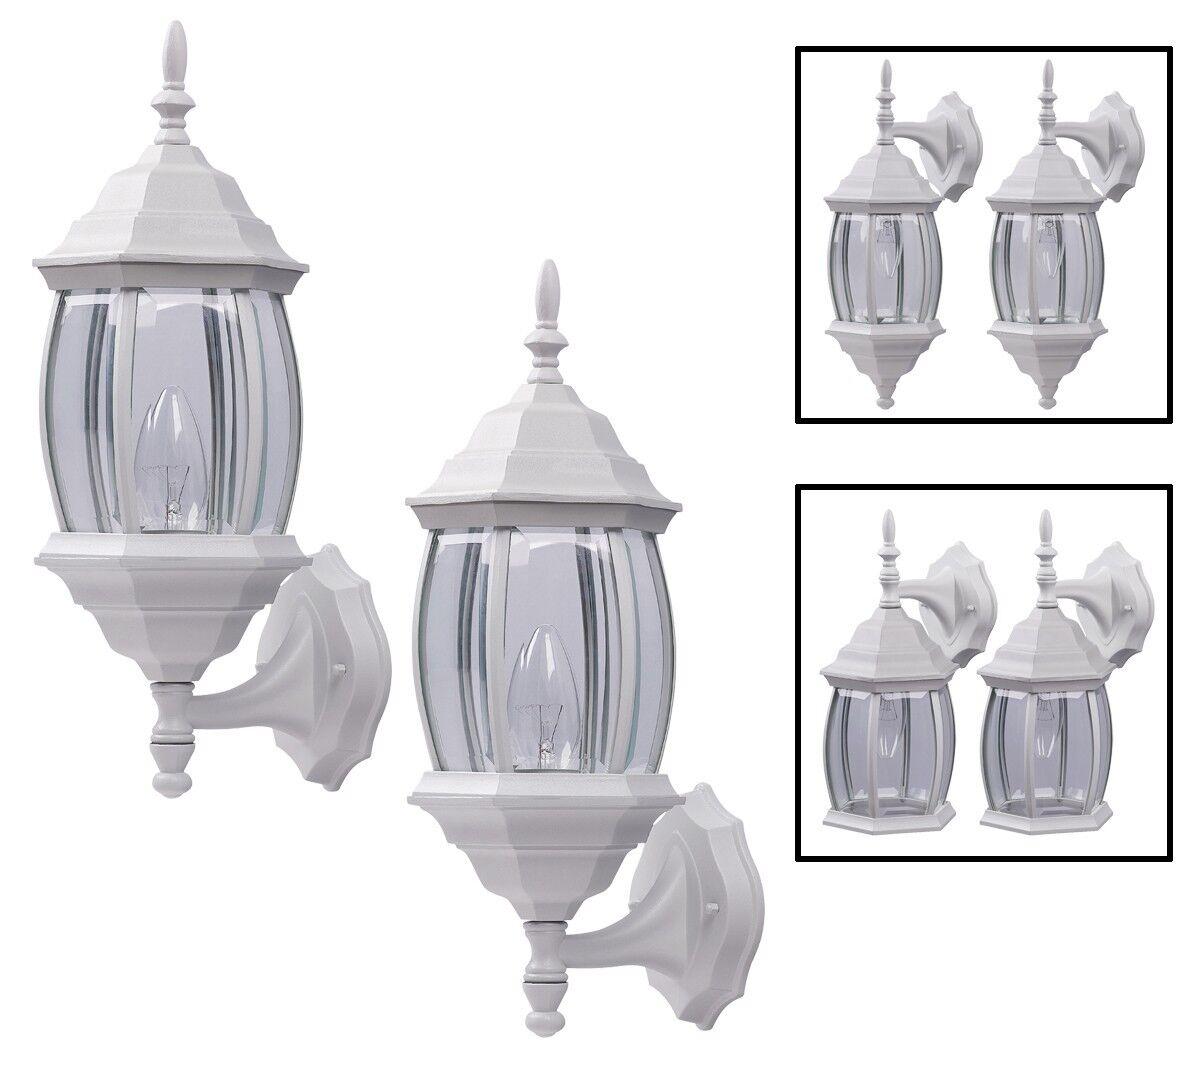 Outdoor Exterior Wall Light Fixture Lantern Downlight/Upligh